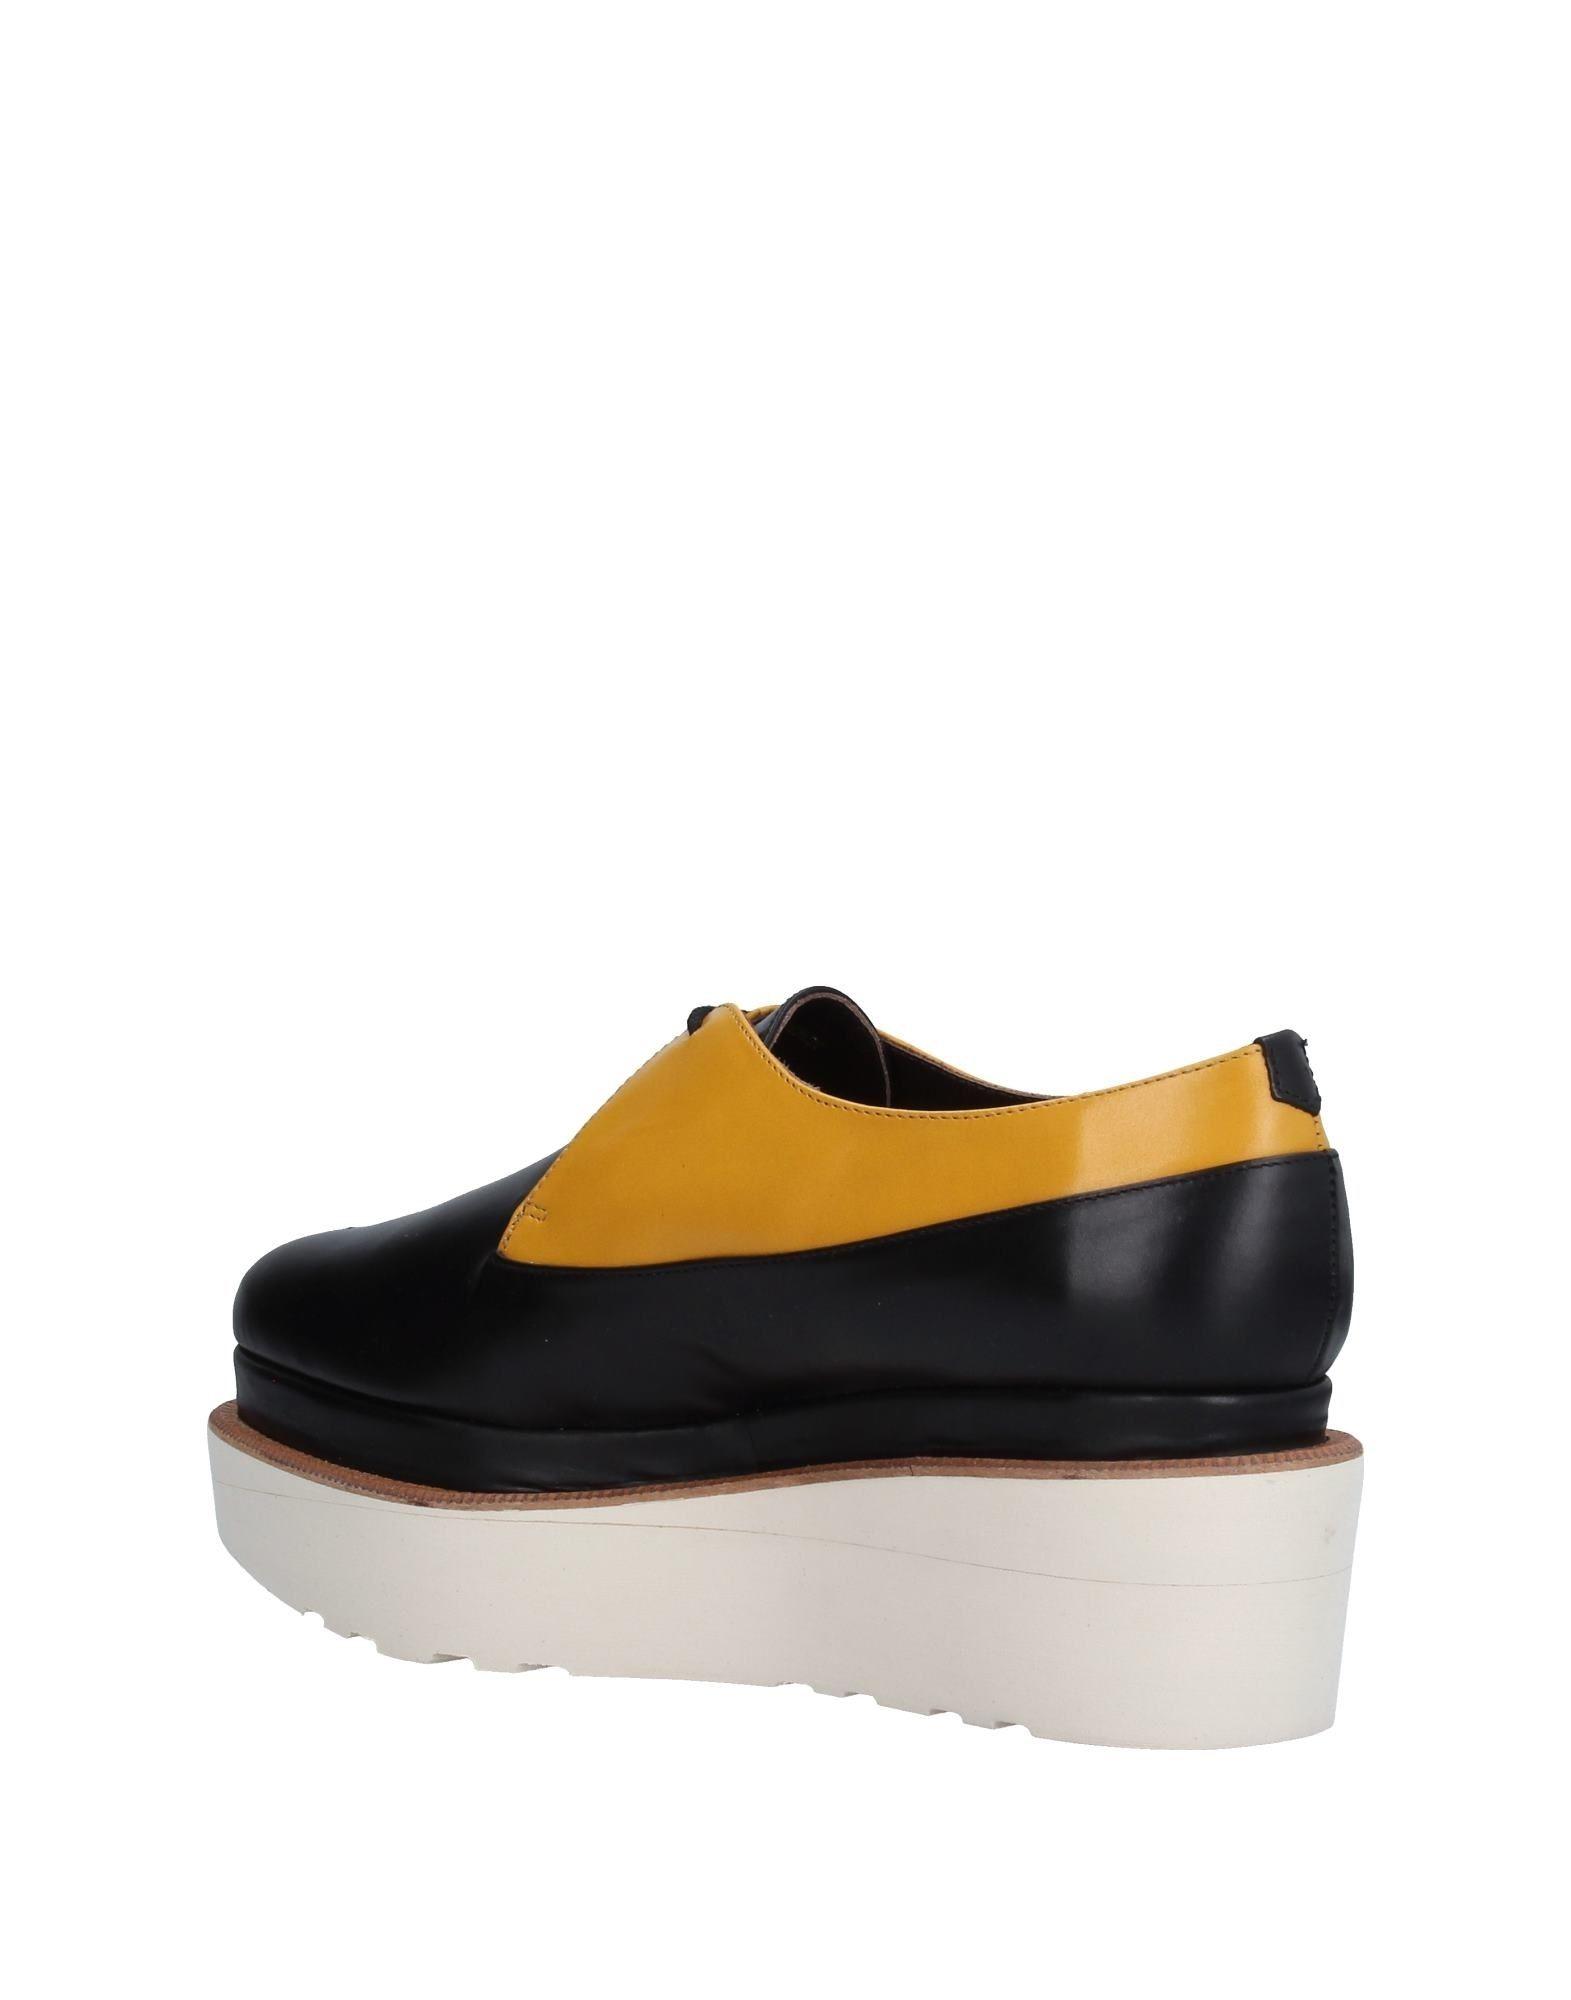 Gut um billige Schuhe  zu tragenPaloma Barceló Schnürschuhe Damen  Schuhe 11224122QN 6978af